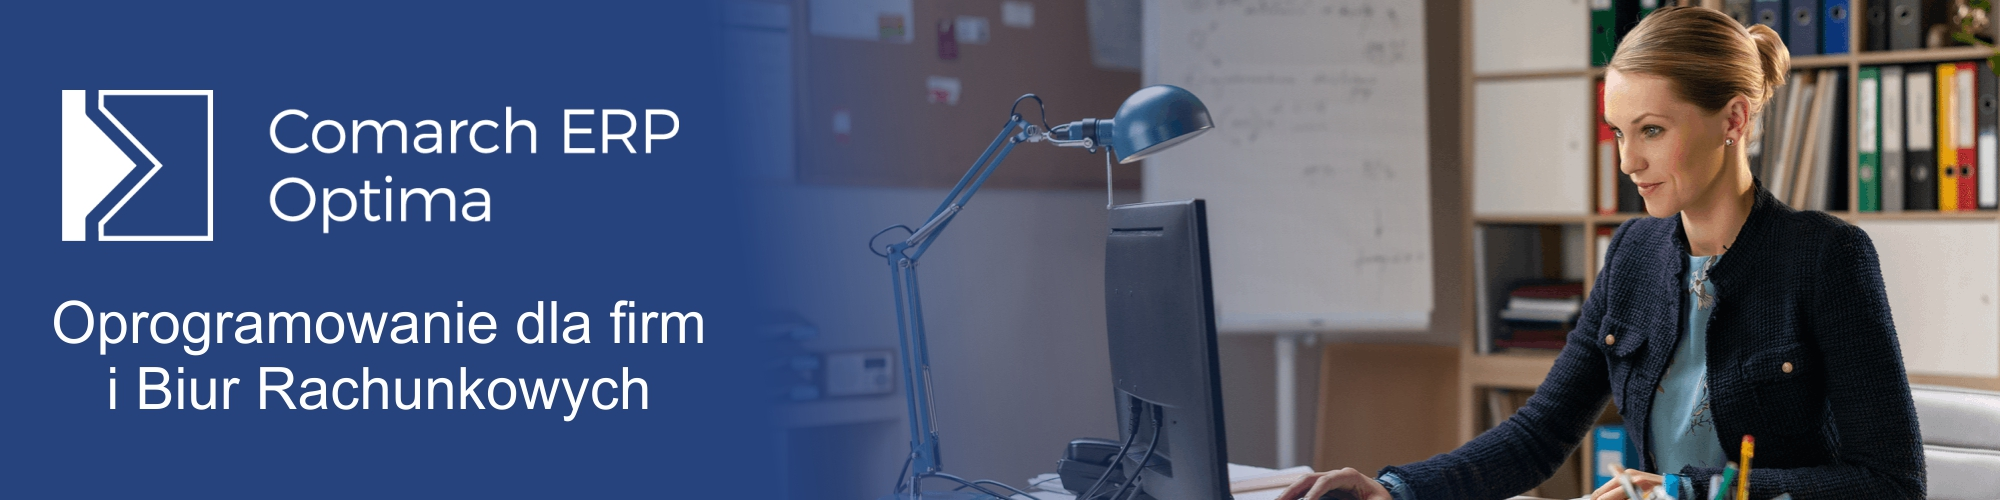 Baner Comarch Optima dla firm i biur rachunkowych